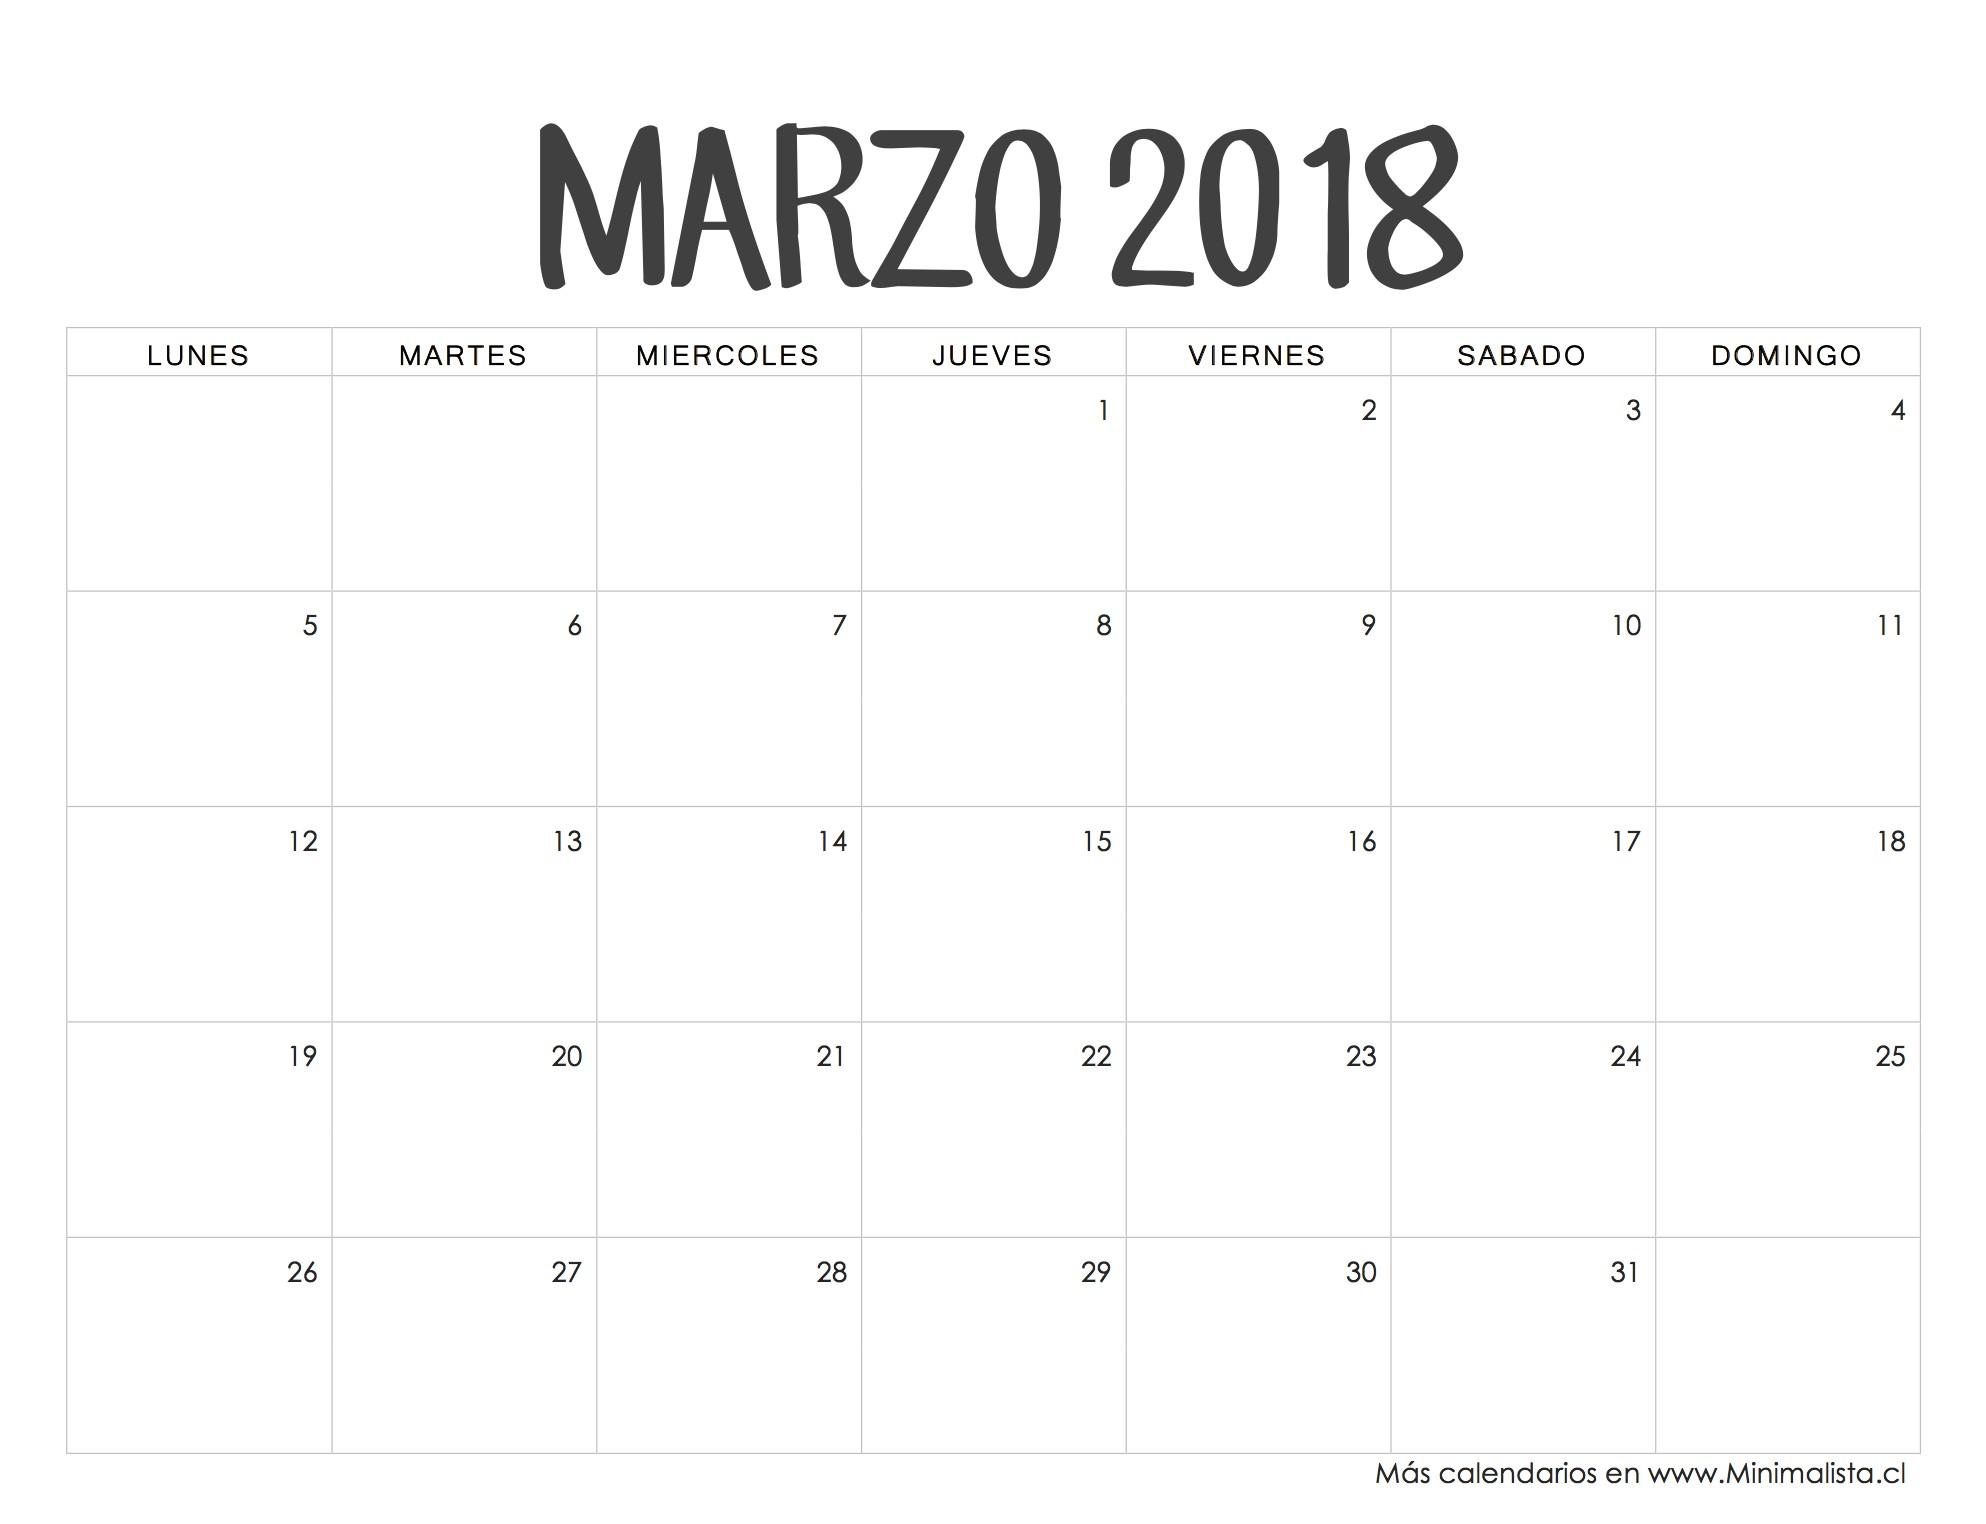 Calendario Enero 2019 Colombia Con Festivos Más Actual Calendario Marzo 2018 Calendarios Pinterest